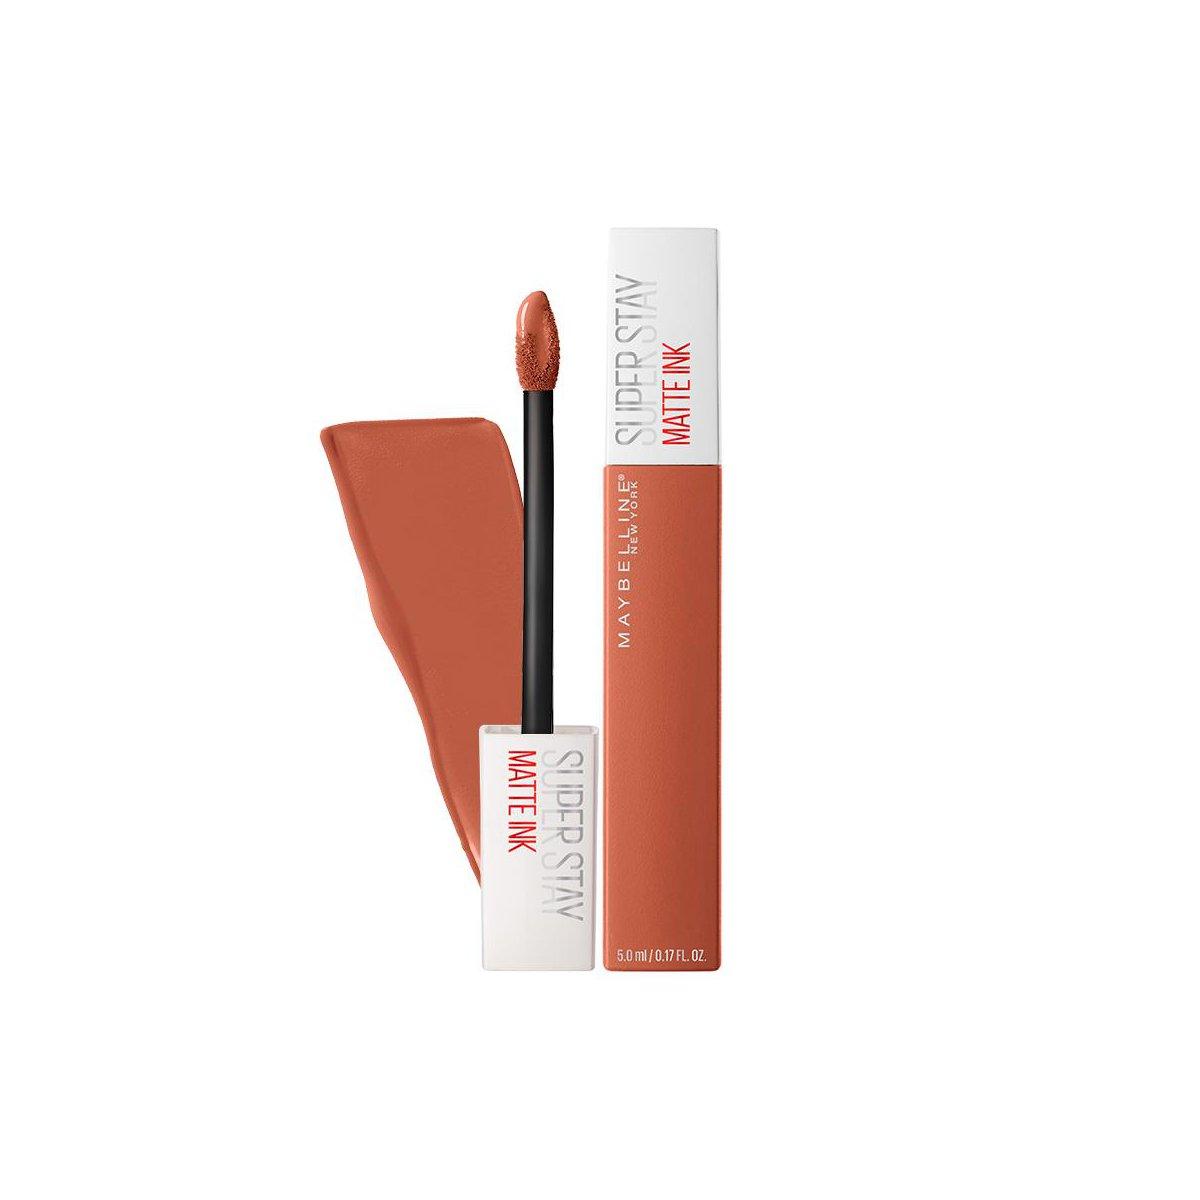 Maybellinne Batom Super Stay Mate Ink 5mL